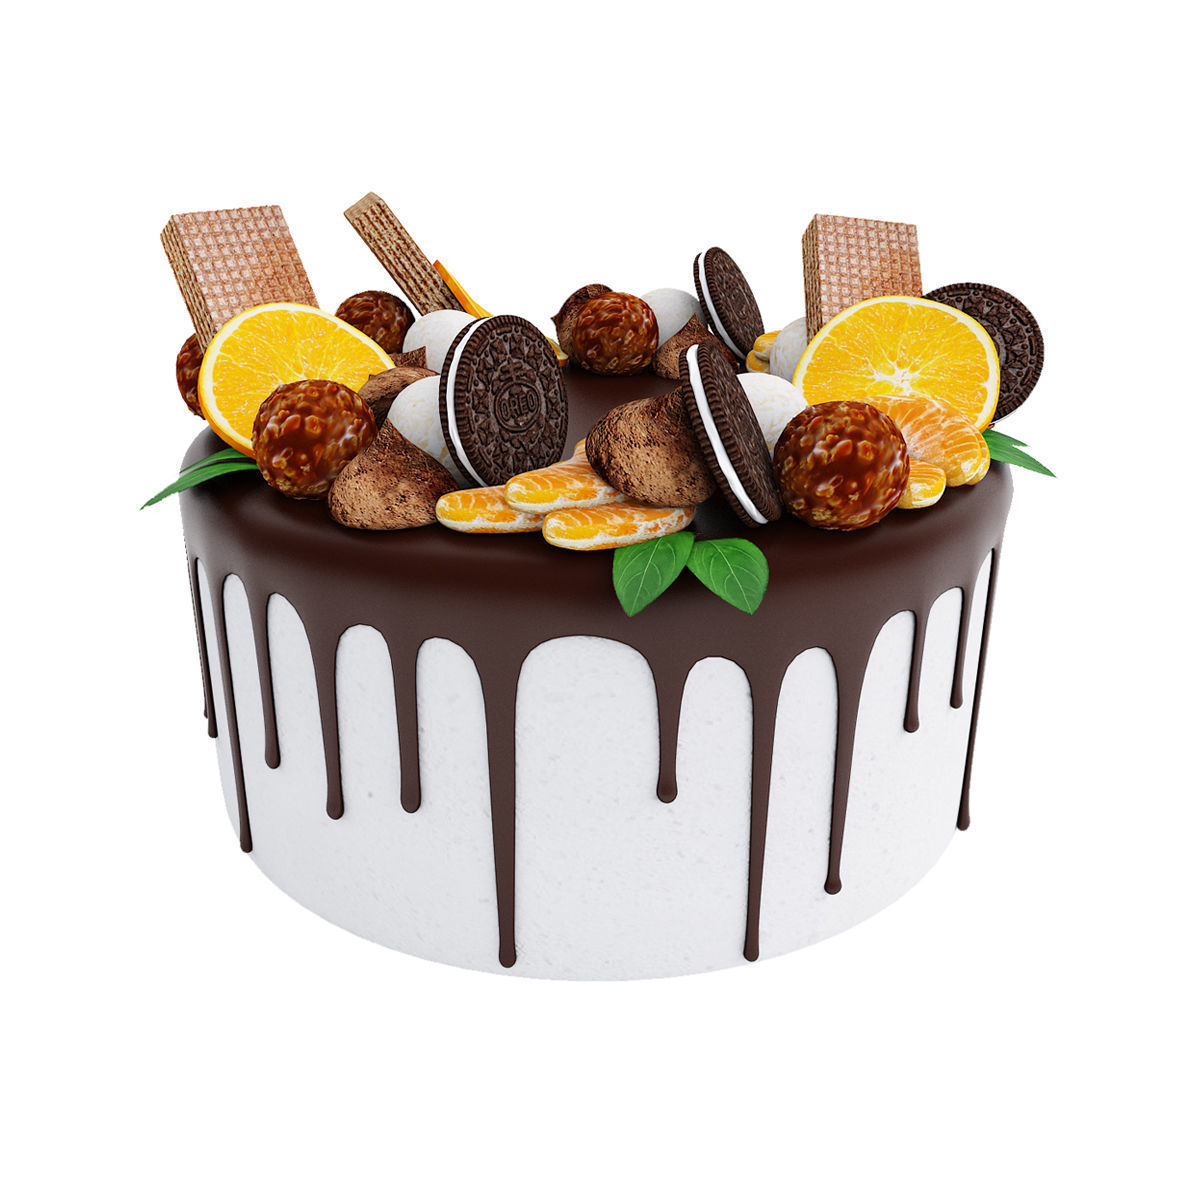 Cake with oreo cookies